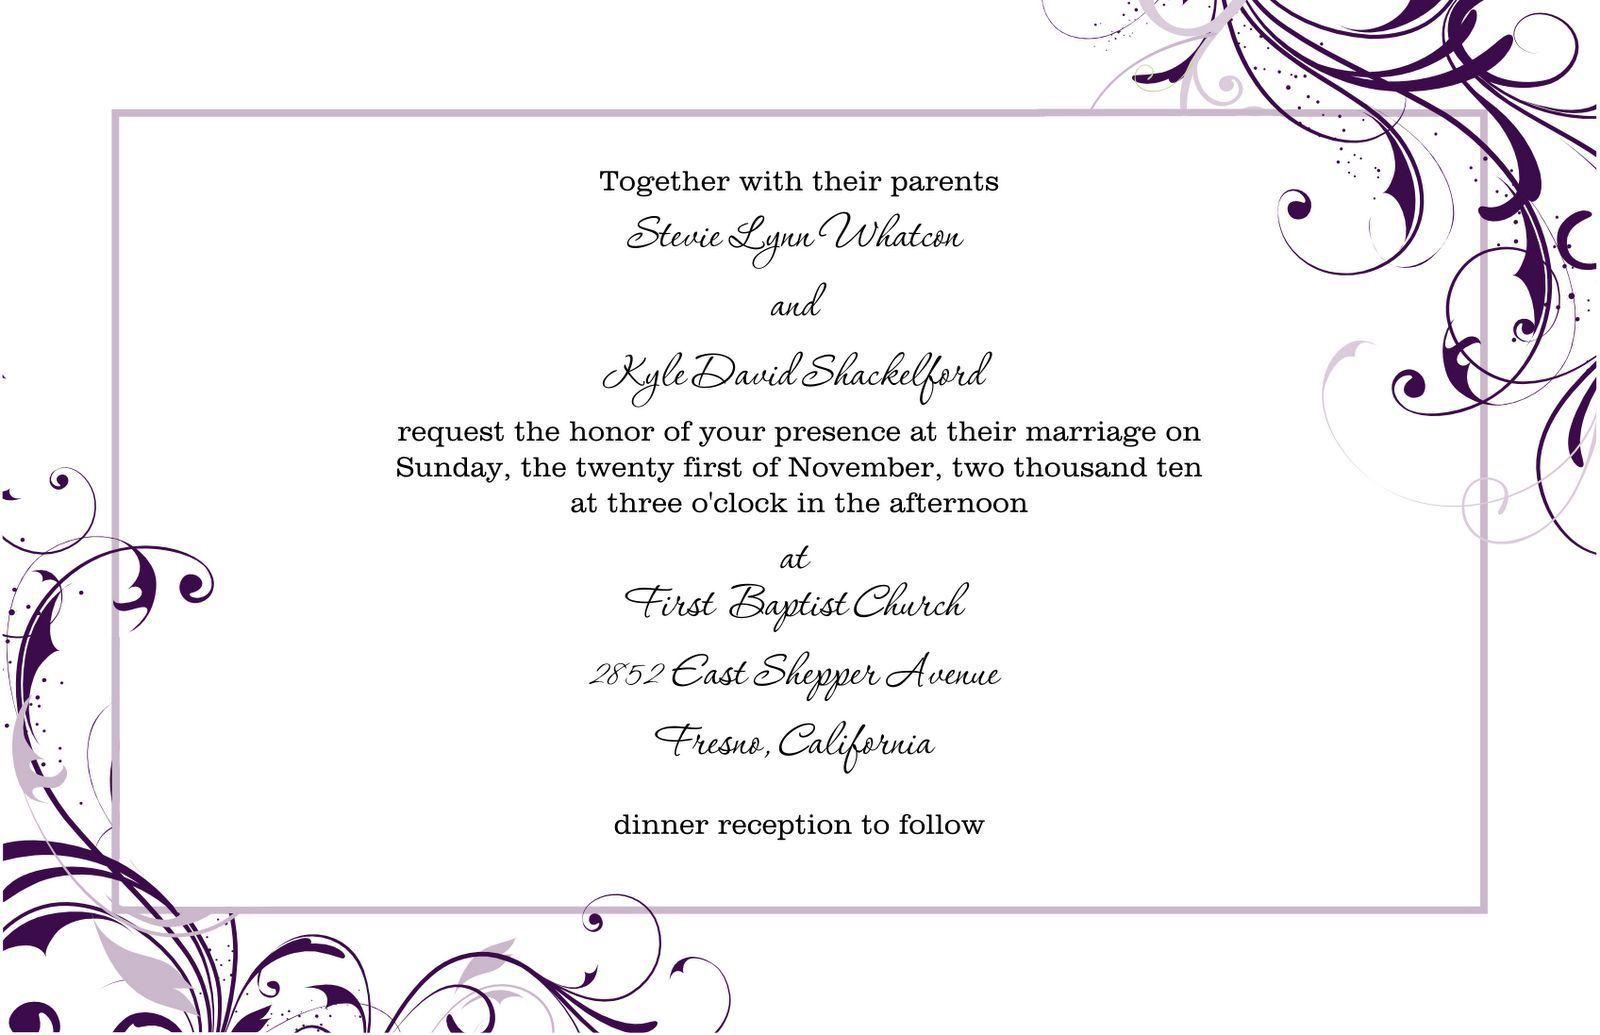 006 Stunning Formal Wedding Invitation Template Free High Resolution Full